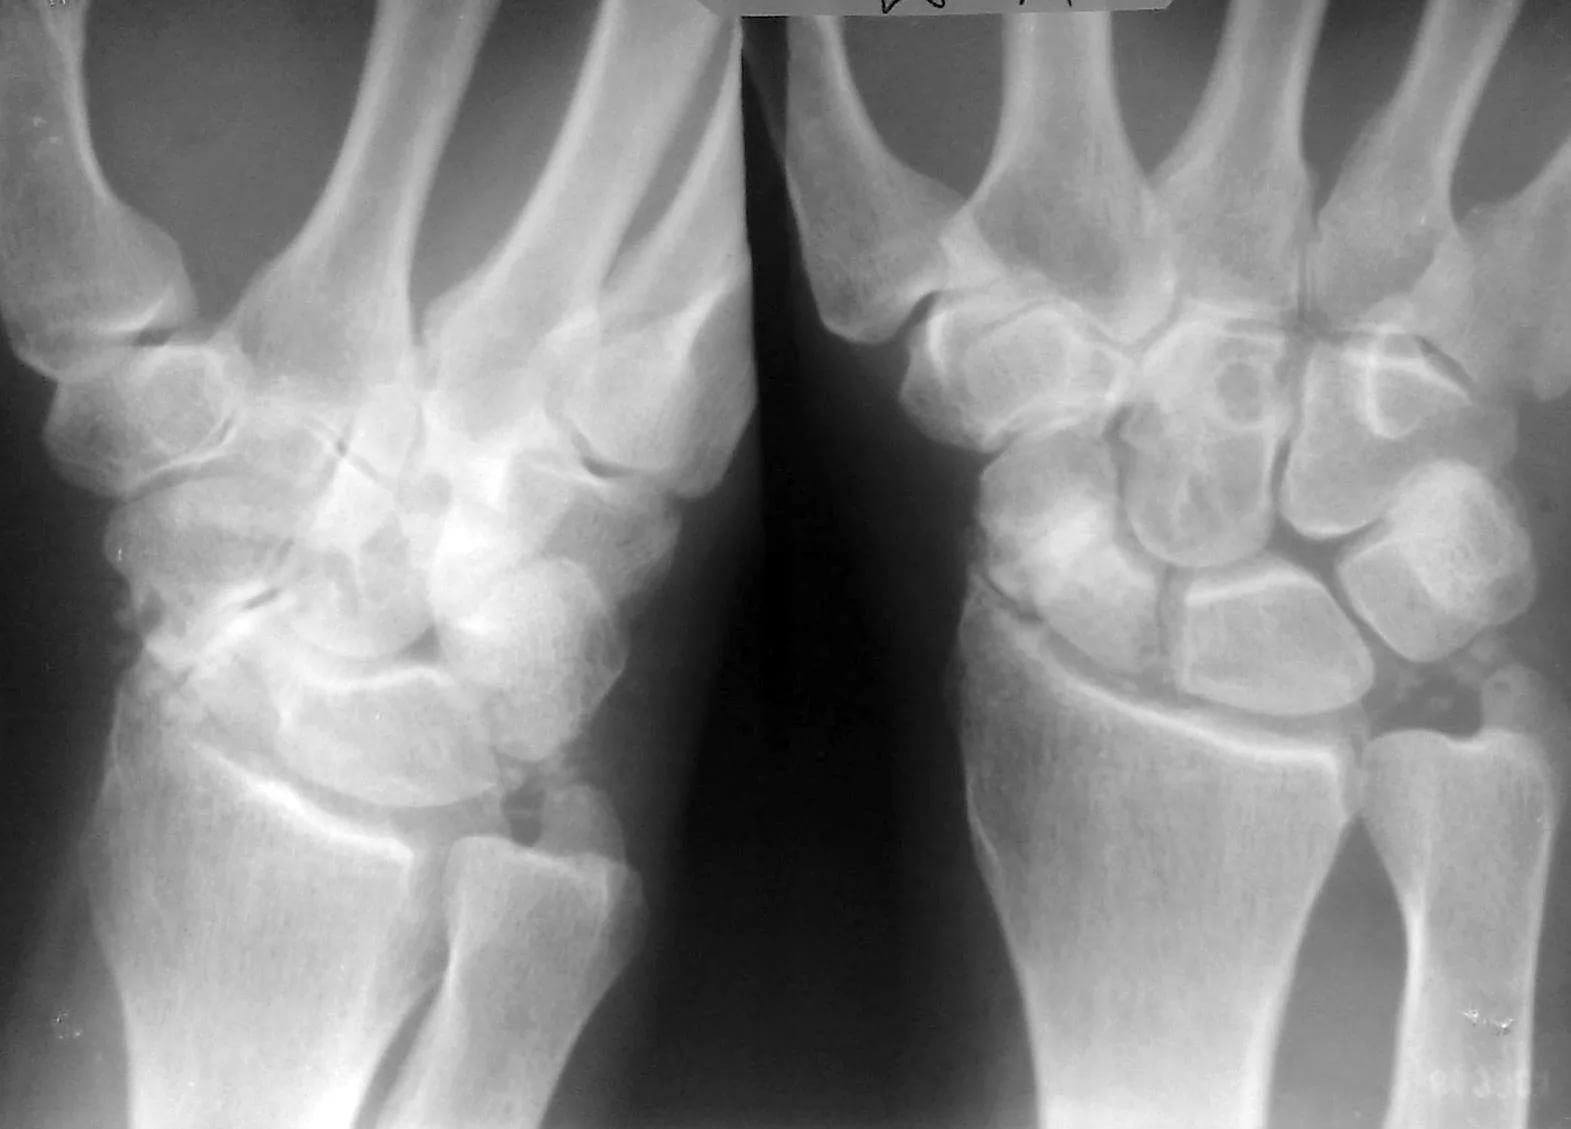 Лечение перелома лучезапястного сустава протез тазобедренного сустава zimmer